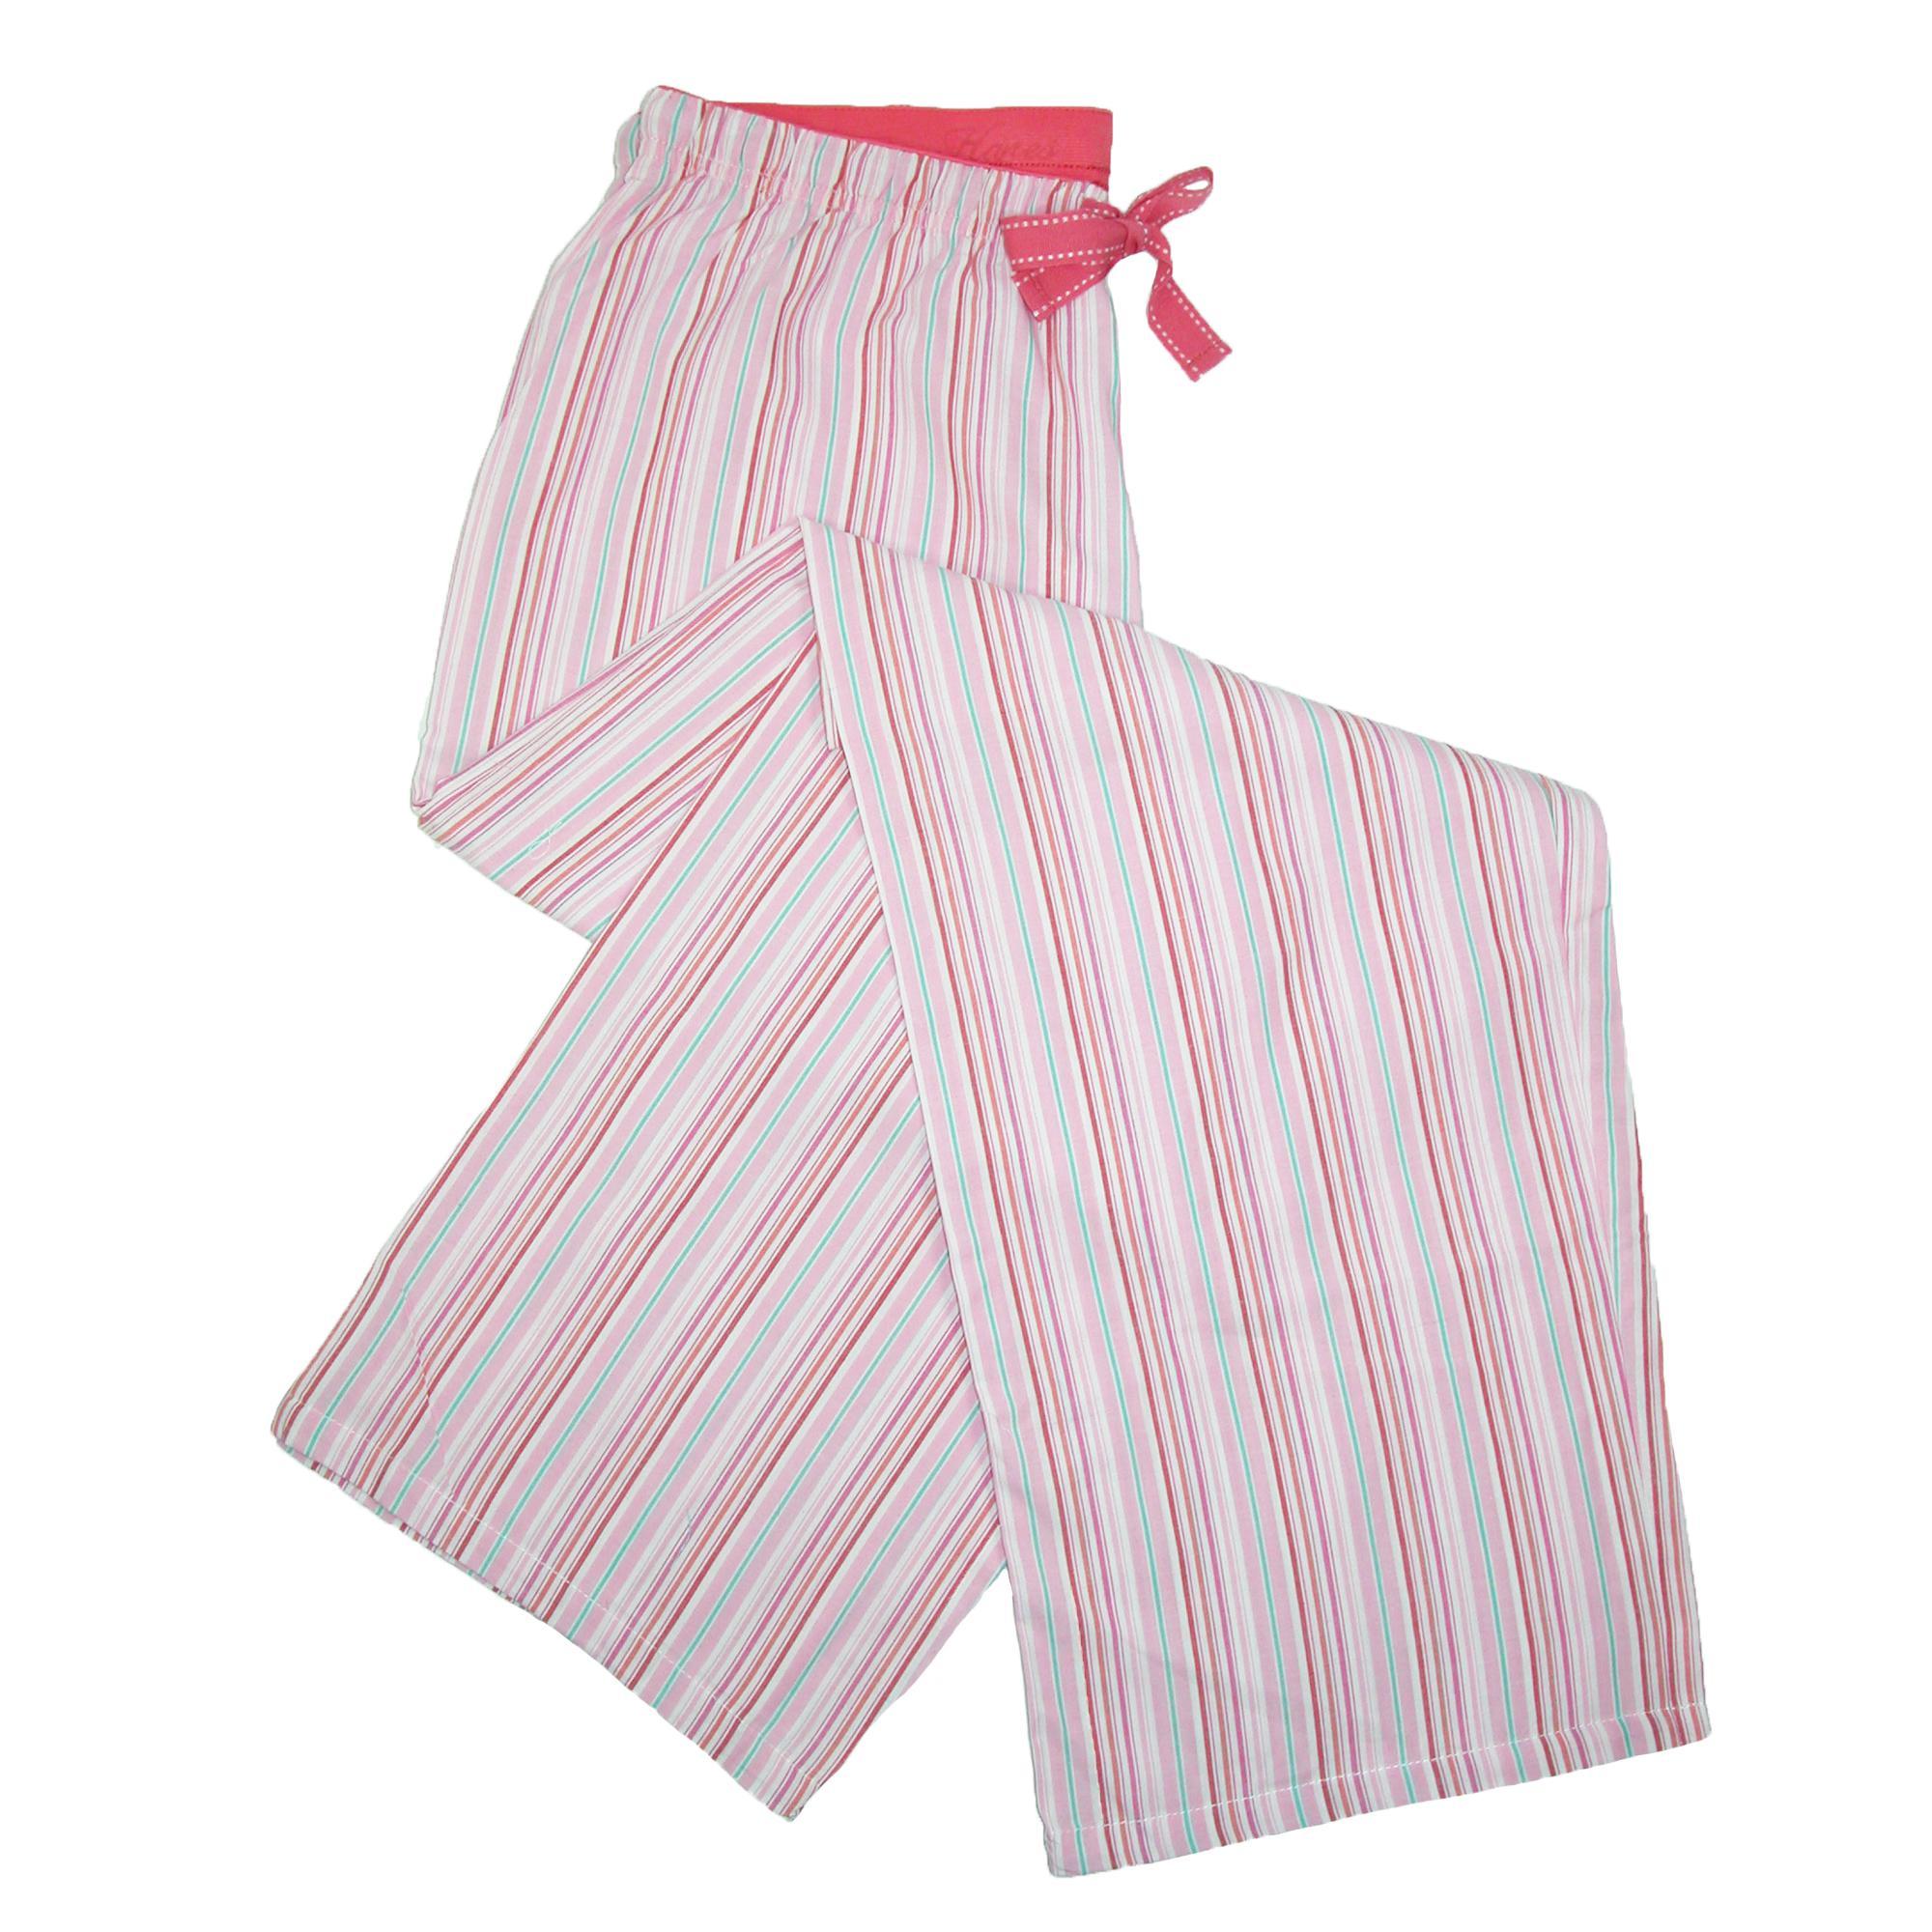 Find great deals on Womens Pajama Bottoms at Kohl's today! Women's Jockey Pajamas: Modern Cotton Pajama Pants. sale. $ Original $ Plus Size Croft & Barrow® Printed Pajama Pants. sale. $ Original $ Plus Size Simply Vera Vera Wang Plush Jogger Pajama Pants.